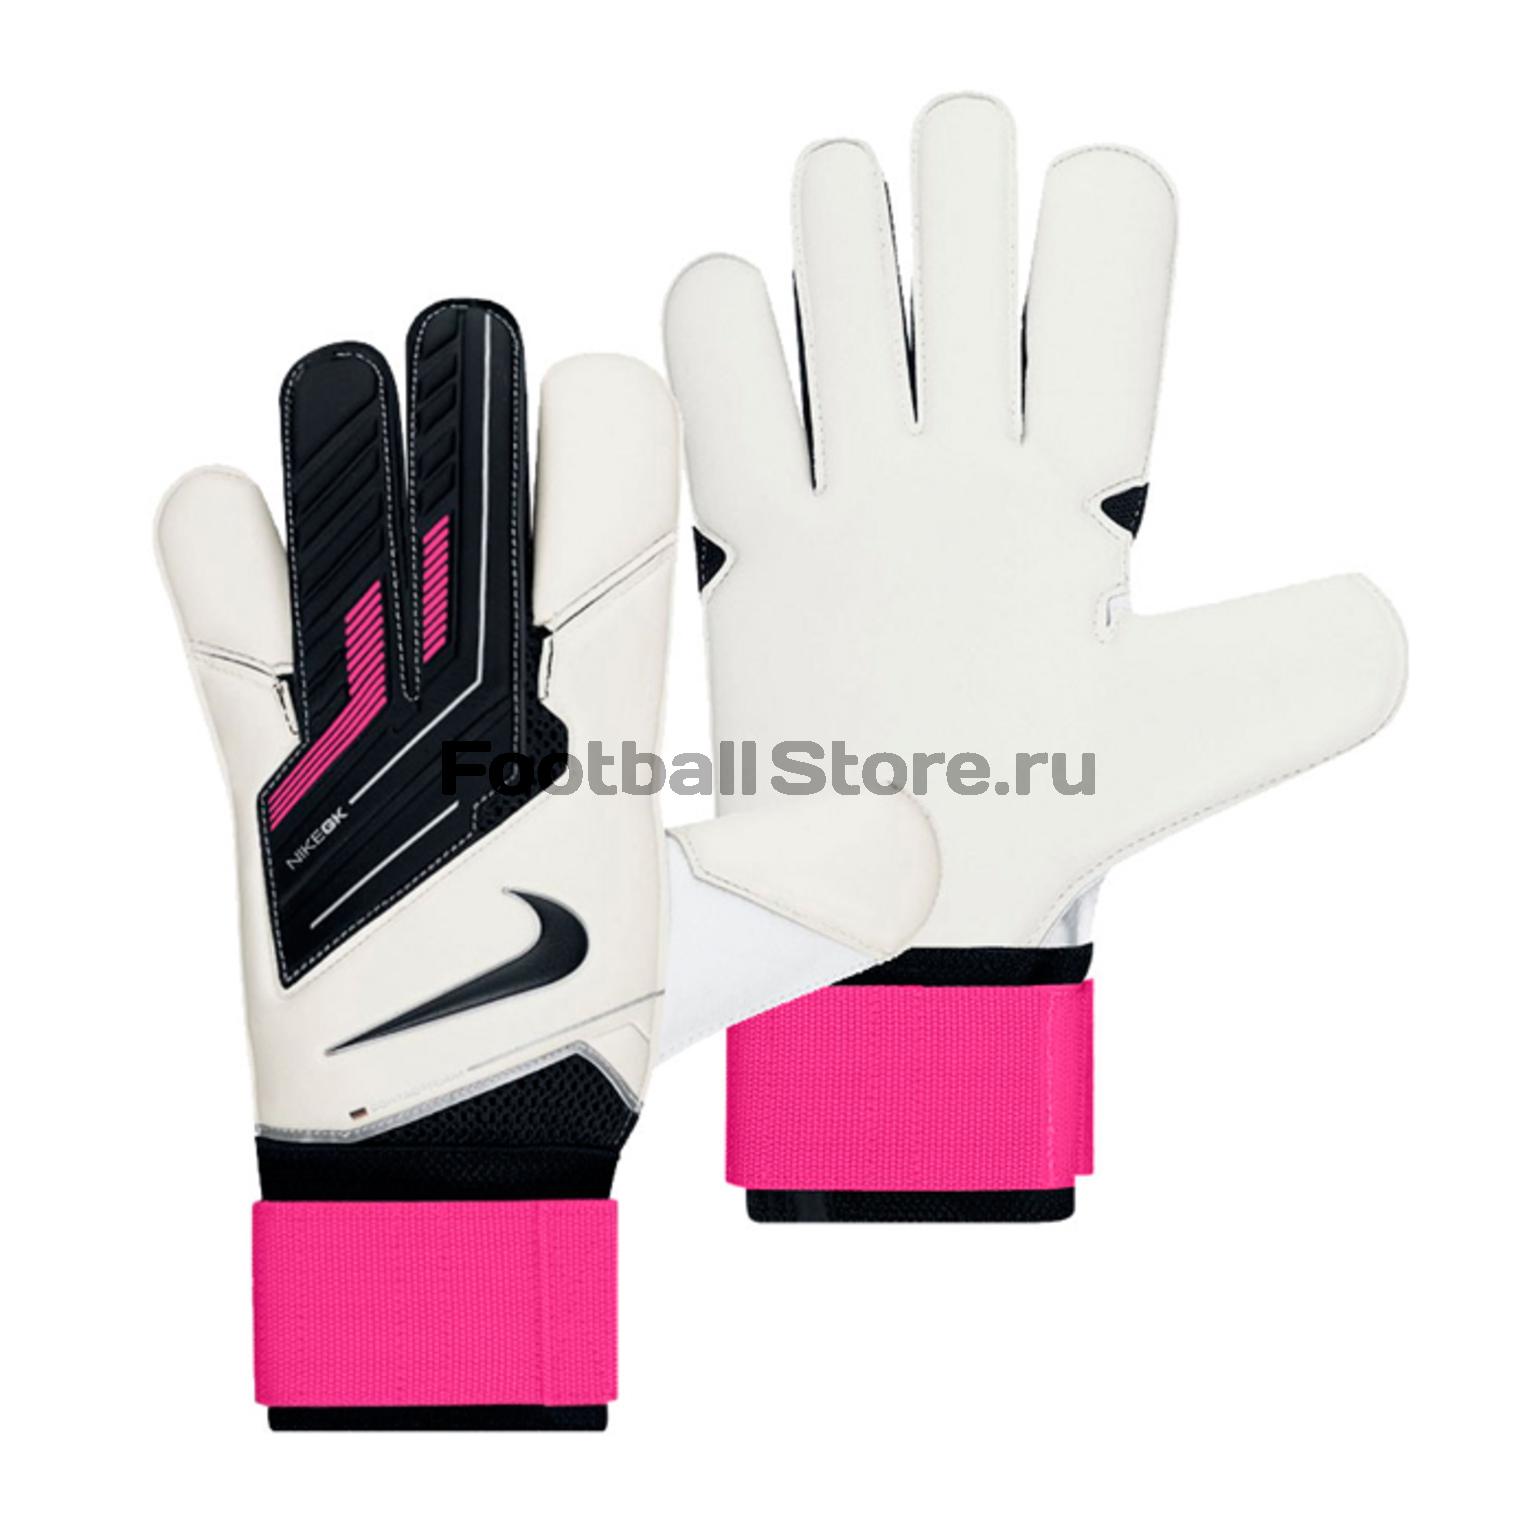 Перчатки Nike Вратарские перчатки Nike GK Vapor Grip 3 GS0252-165